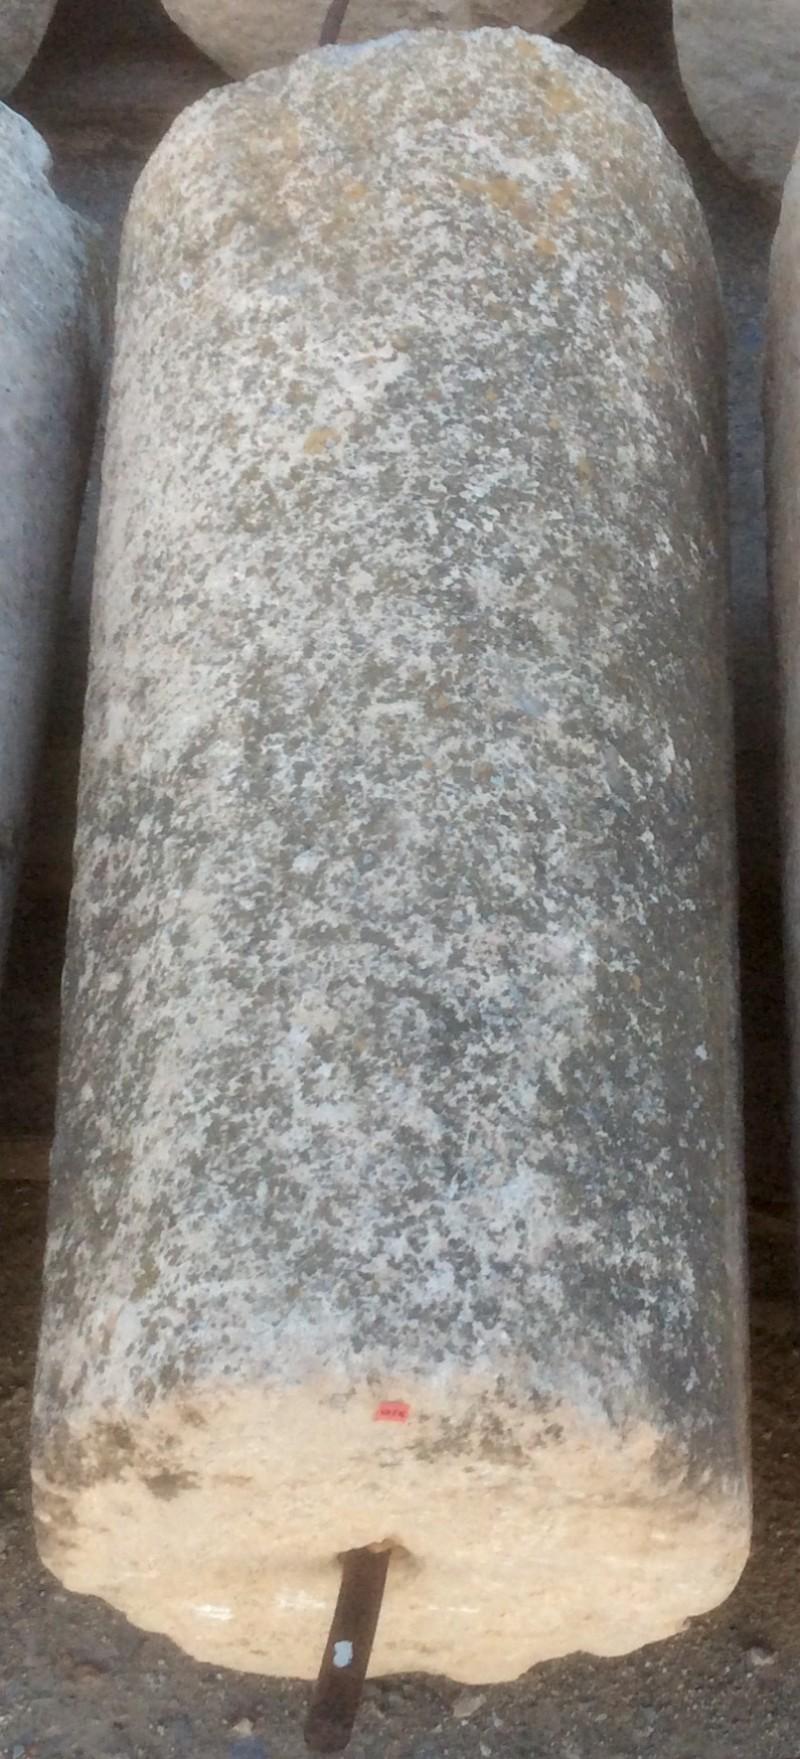 Rulo de piedra caliza. Mide 46 cm de diámetro x 1.04 cm de alto.